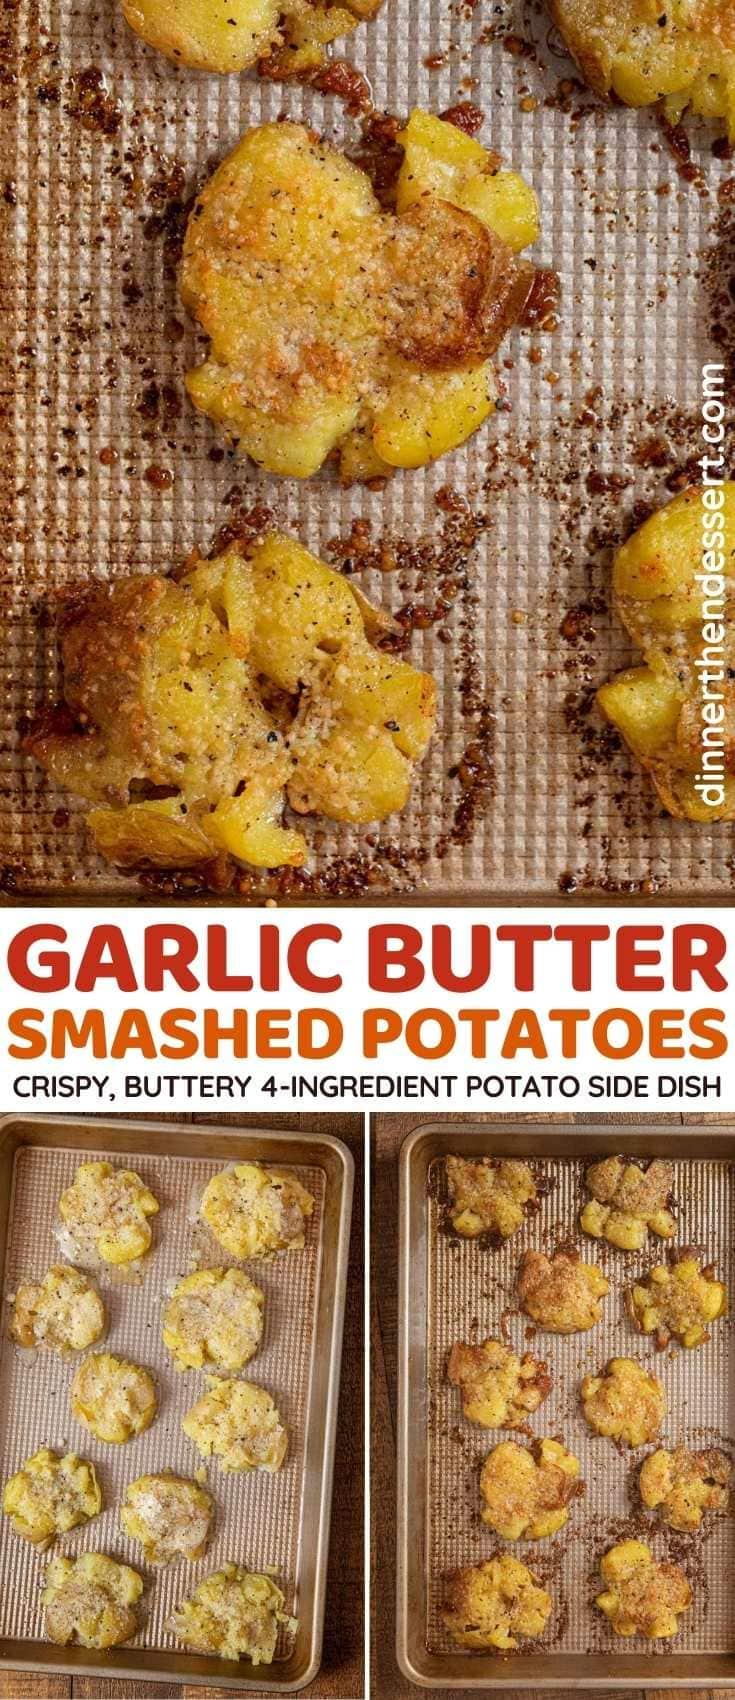 Garlic Butter Smashed Potatoes collage